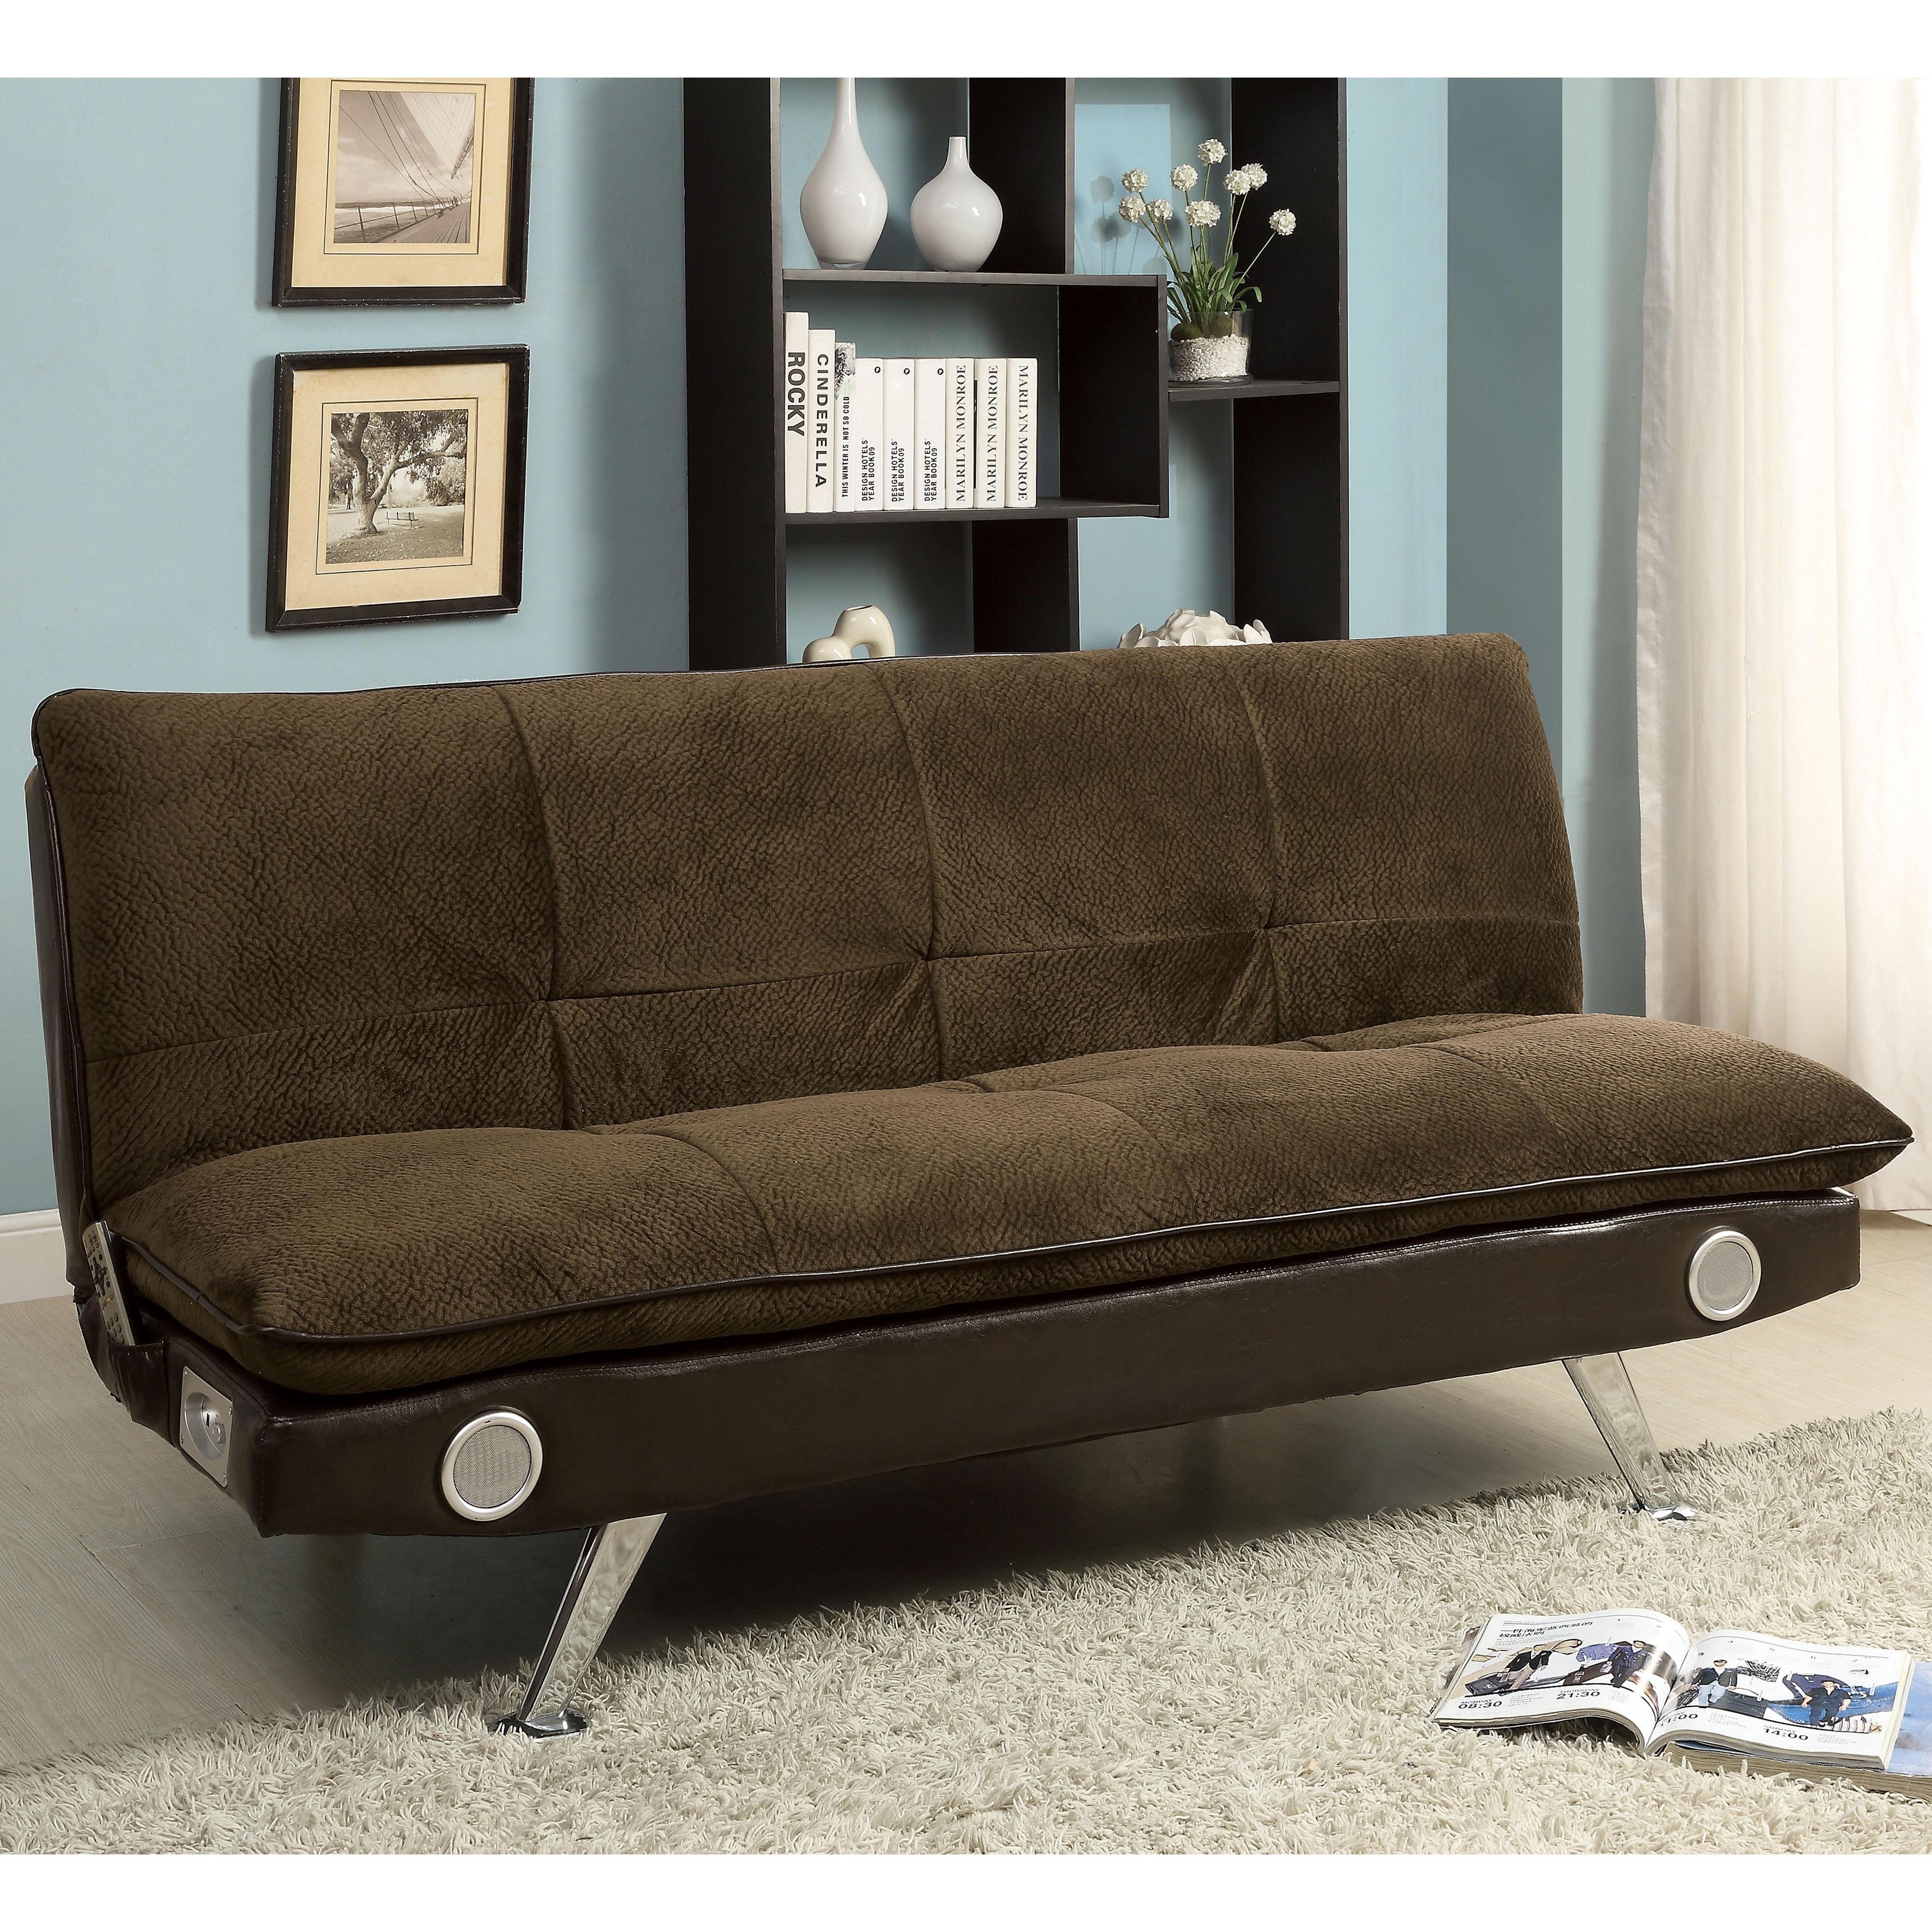 Furniture of America Thrain Modern 2-Tone Futon Sofa with...